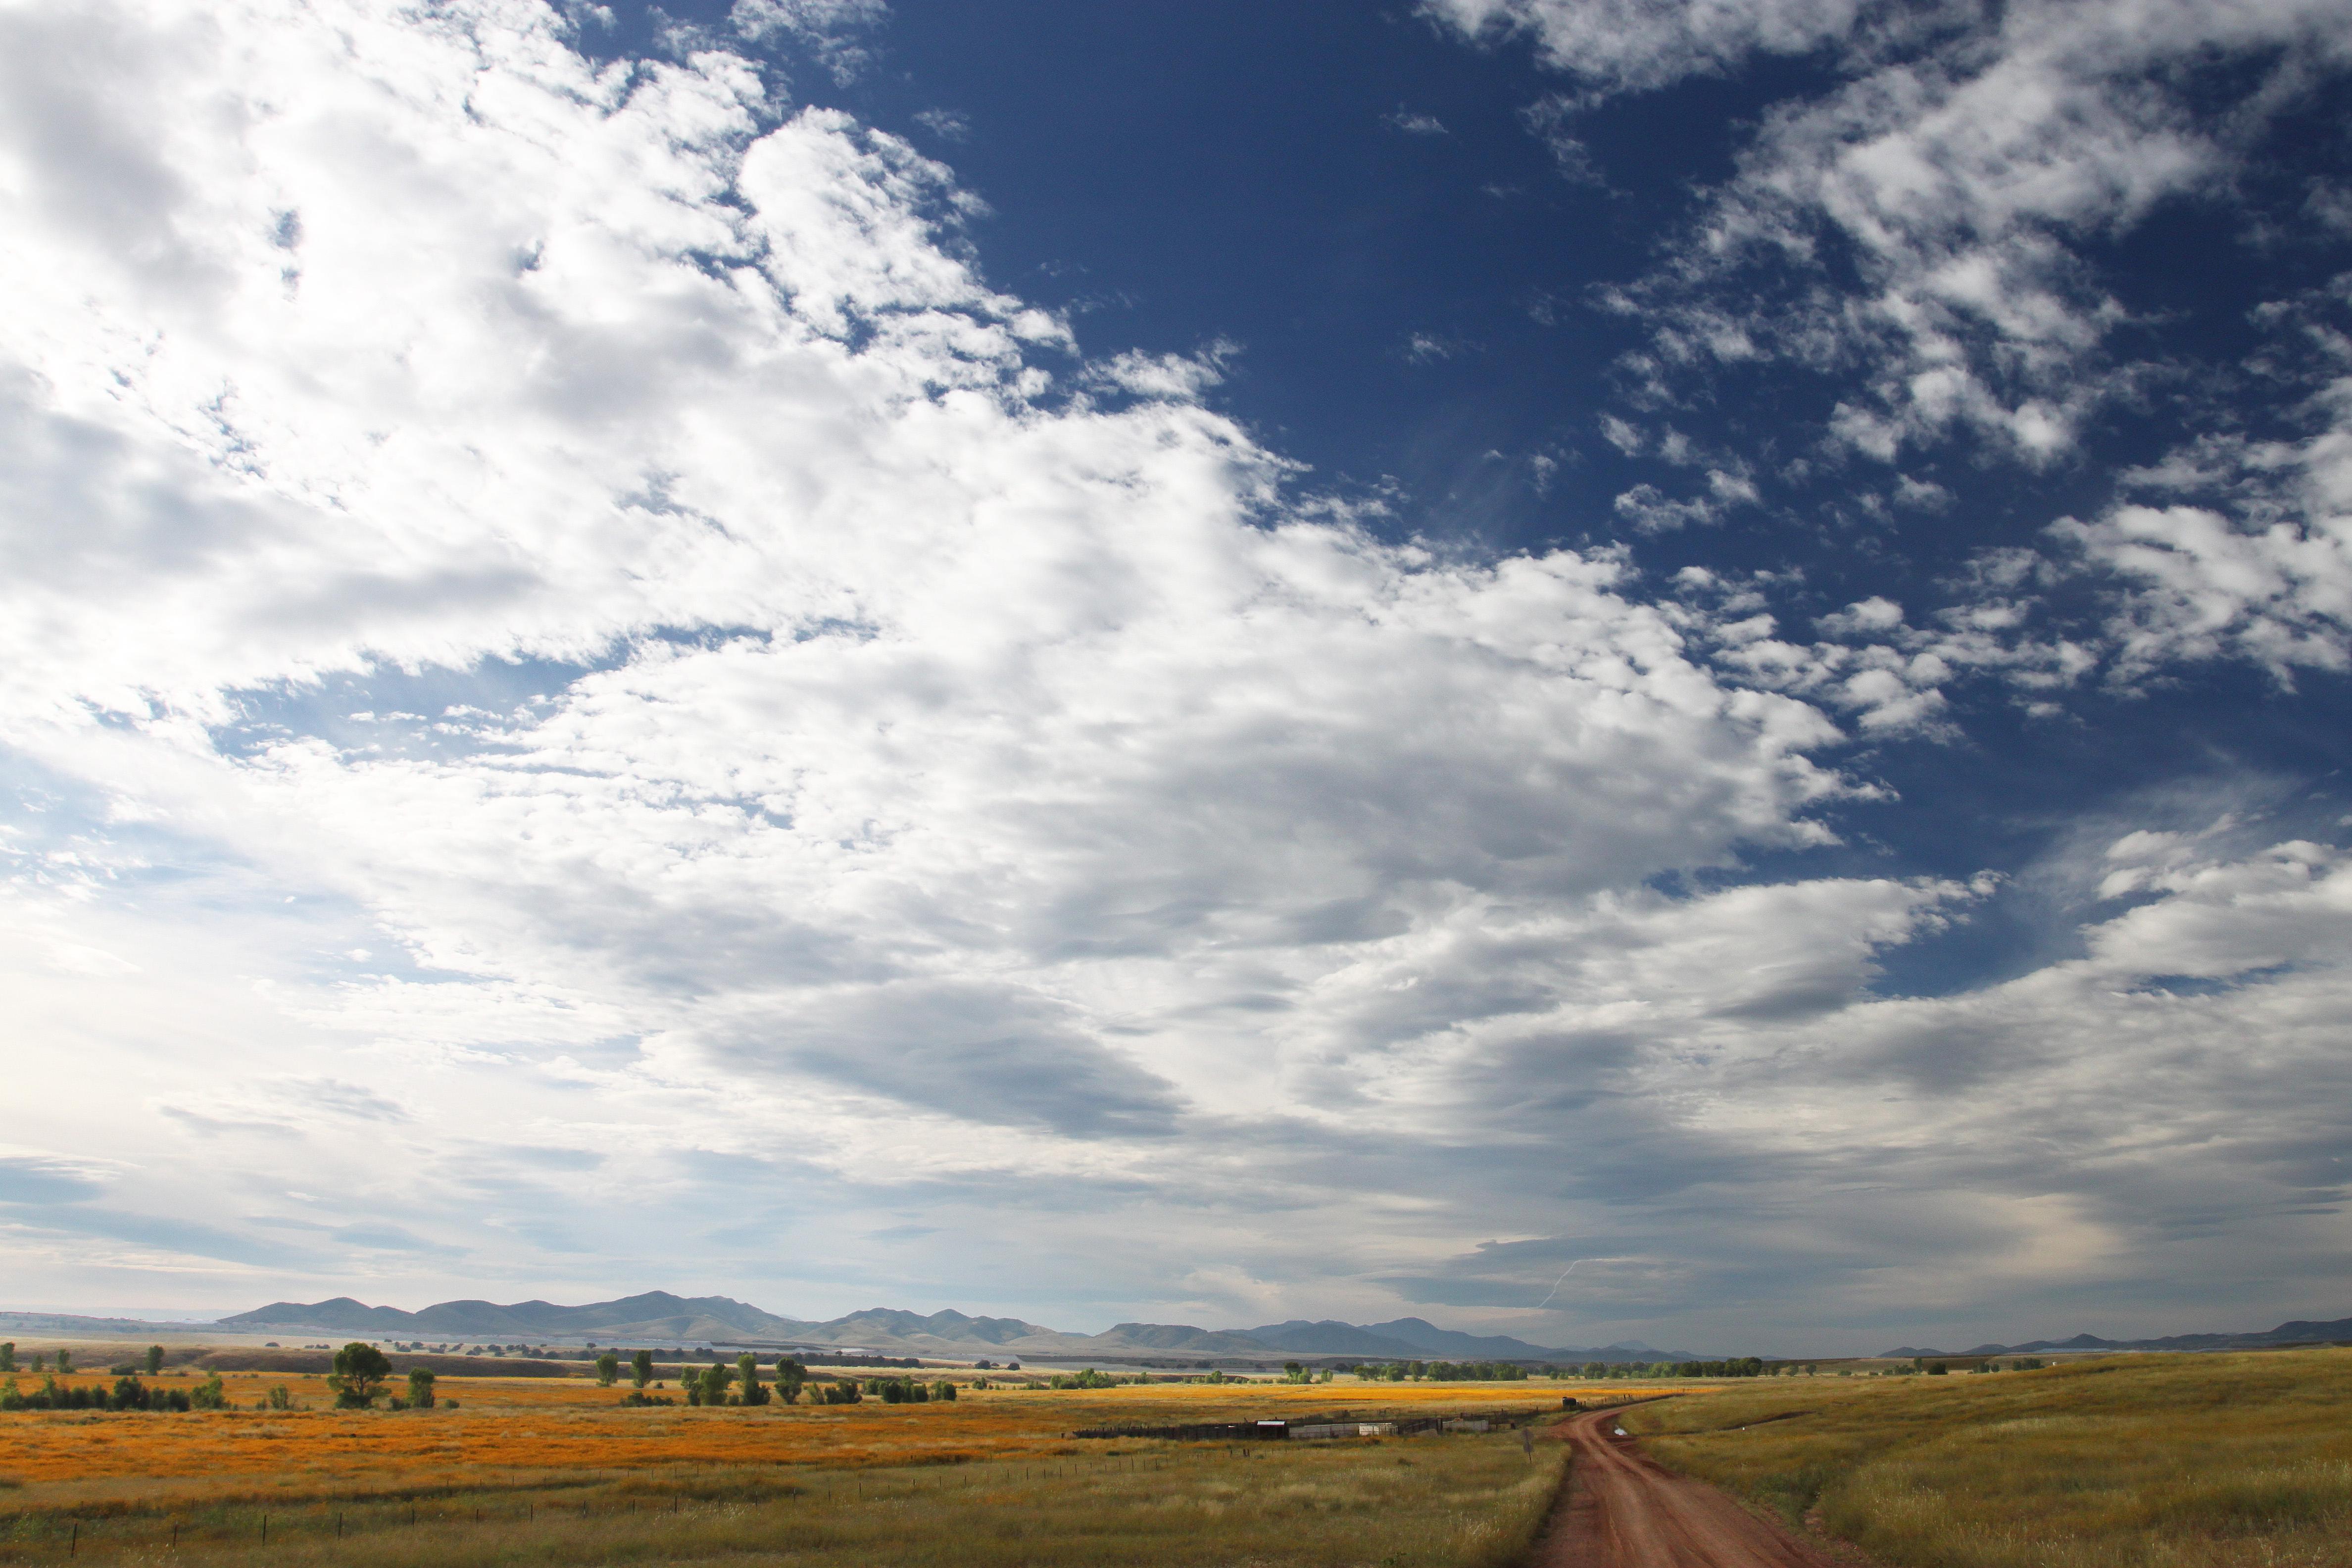 San rafael valley grasslands, se of patagonia, scc, az (9-27-10) - morning light -11 photo